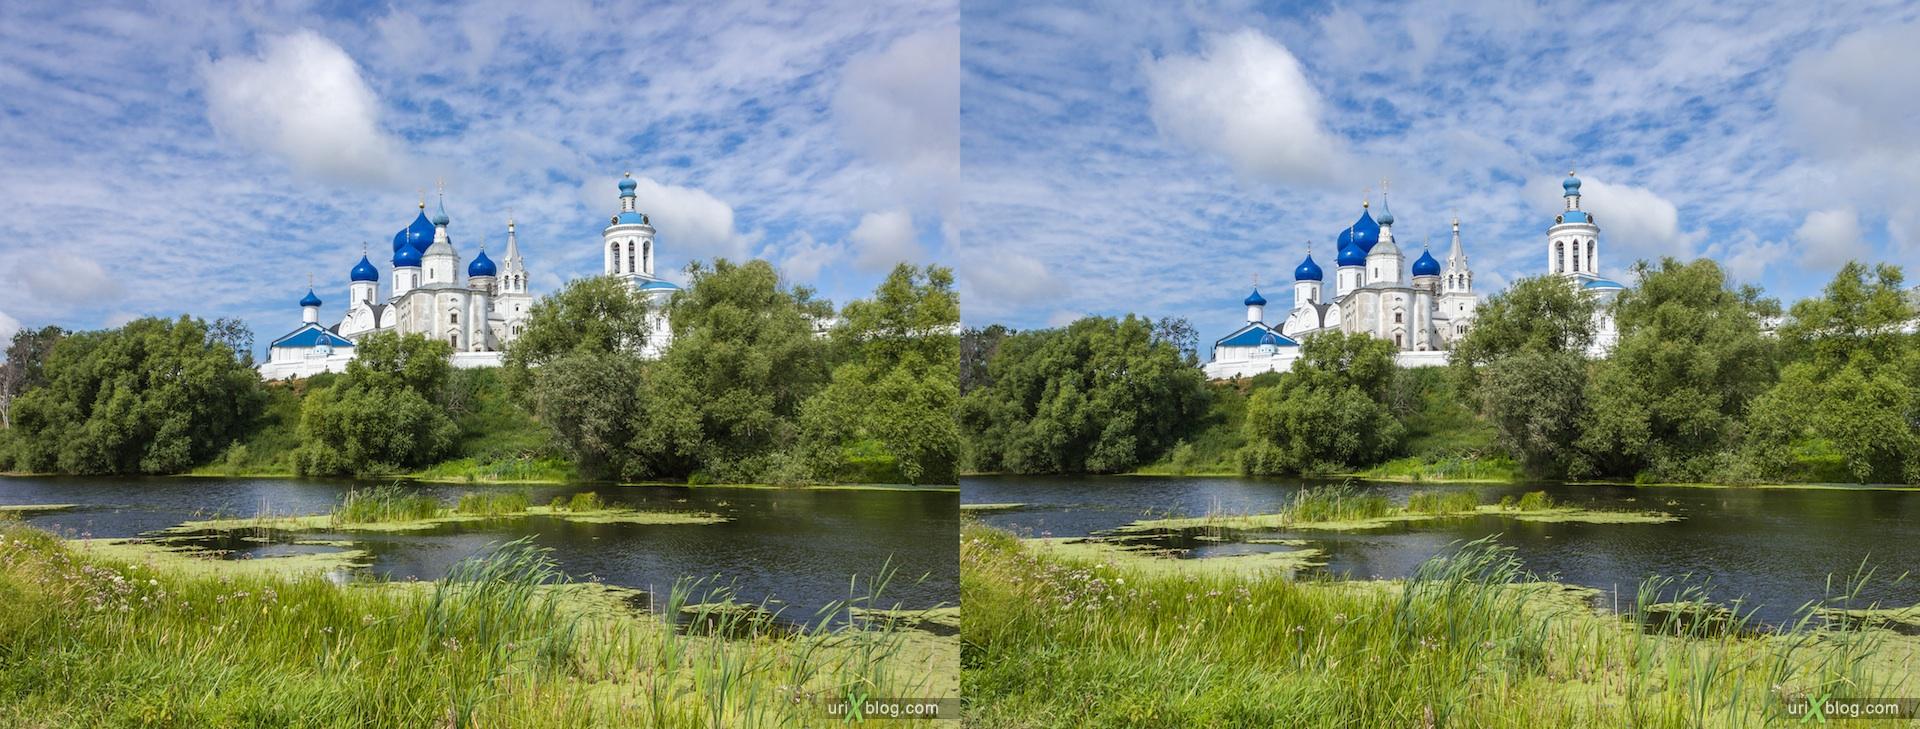 2012 3D stereo stereo pair 3Д стерео церковь храм монастырь владимирская область боголюбово, Church Bogolyubovo monastery